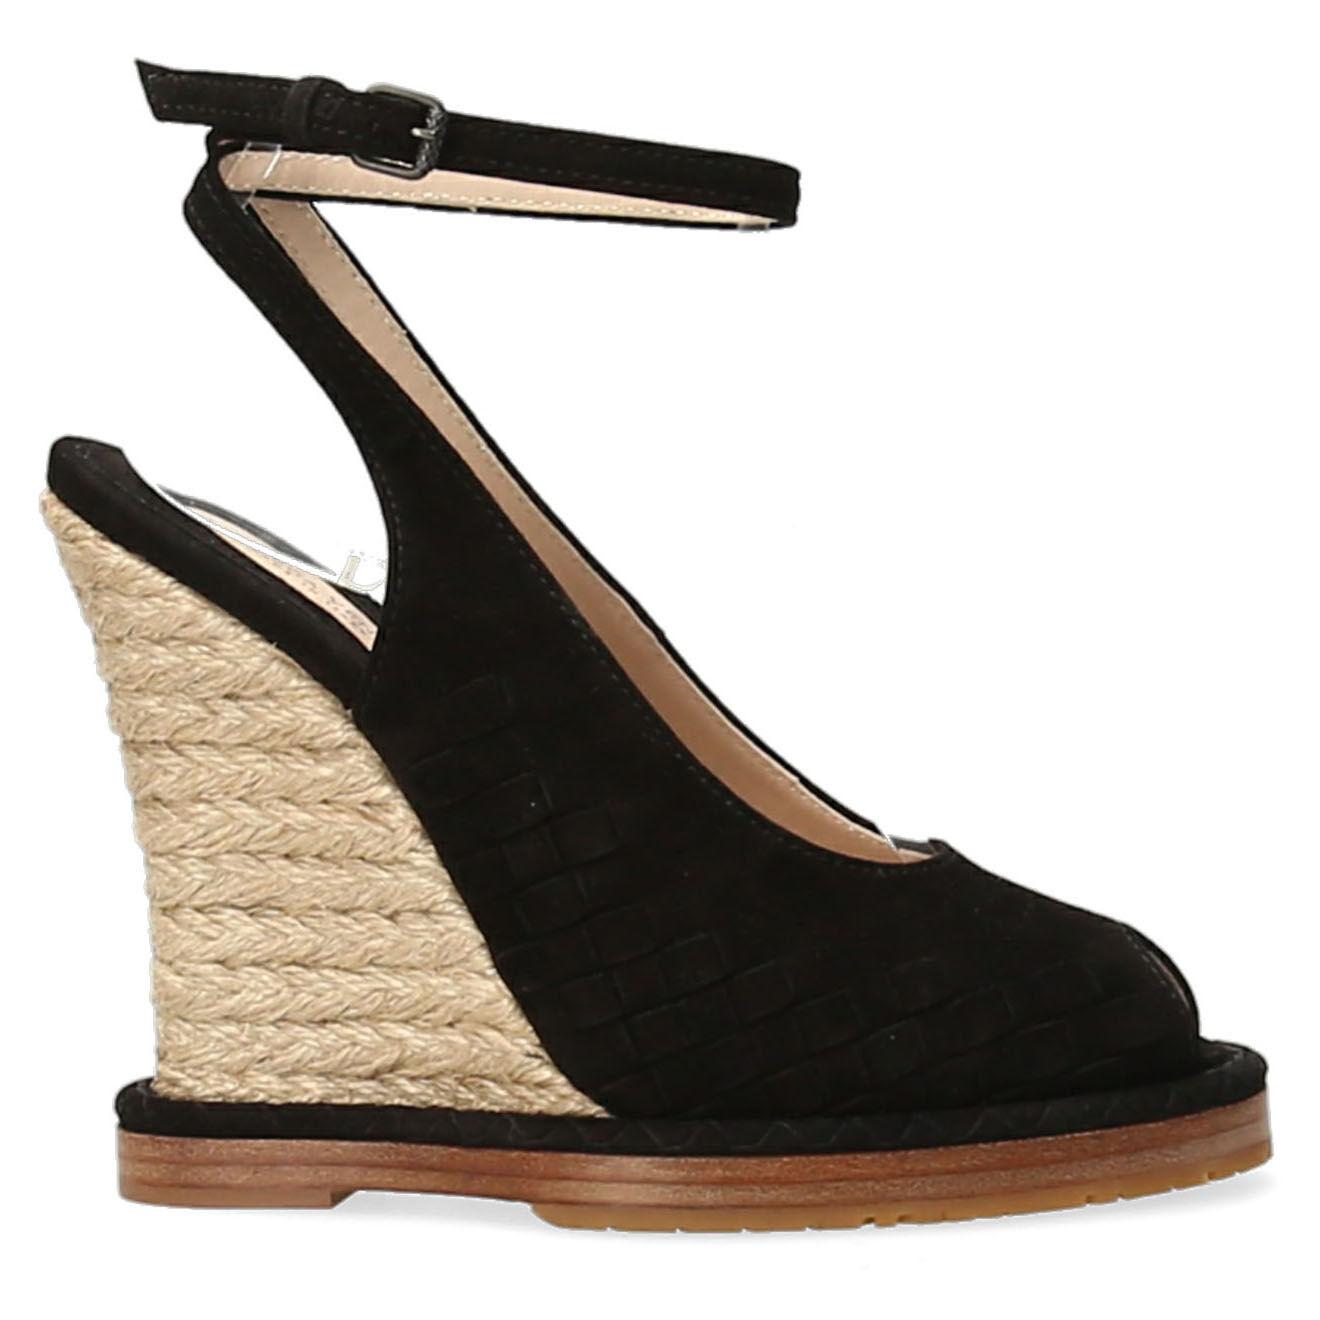 Sandales compensées en Velours de Cuir - Talon 10.5 cm - Bottega veneta - Modalova